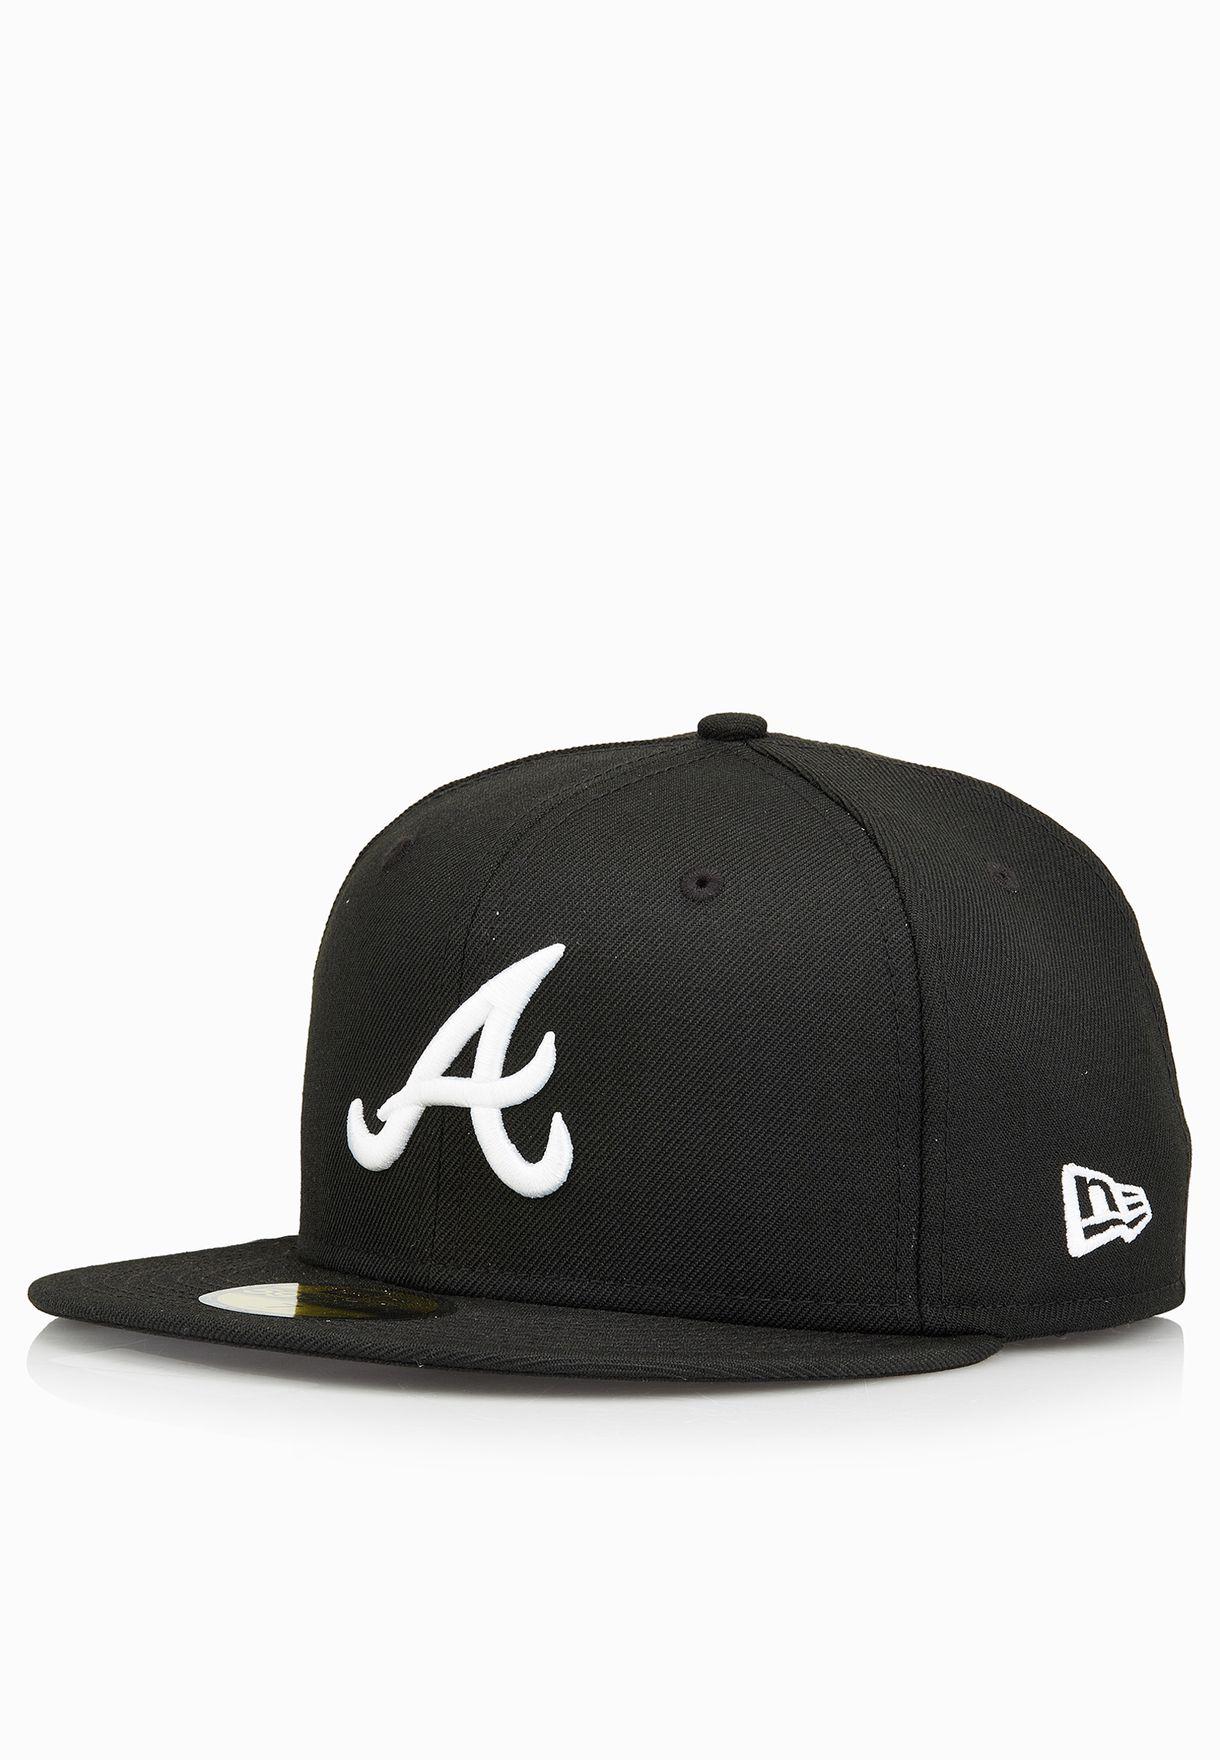 brand new e06f0 ad3a2 59fifty Atlanta Braves Snapback